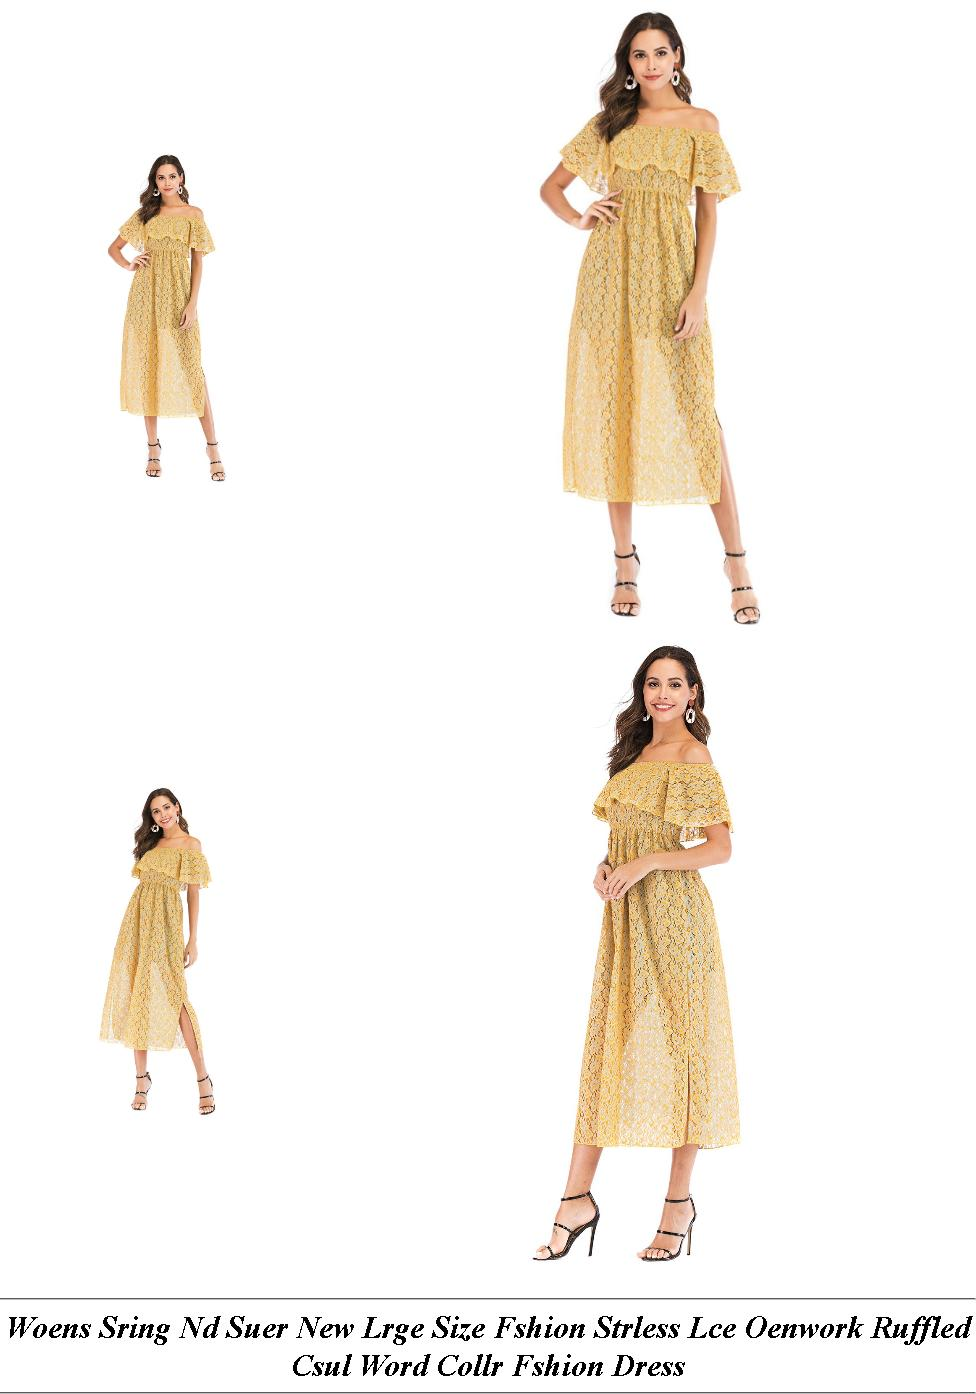 Old Navy Womens Dress Shirts - Season Sale Online - Ladies Garments Shops In Duai